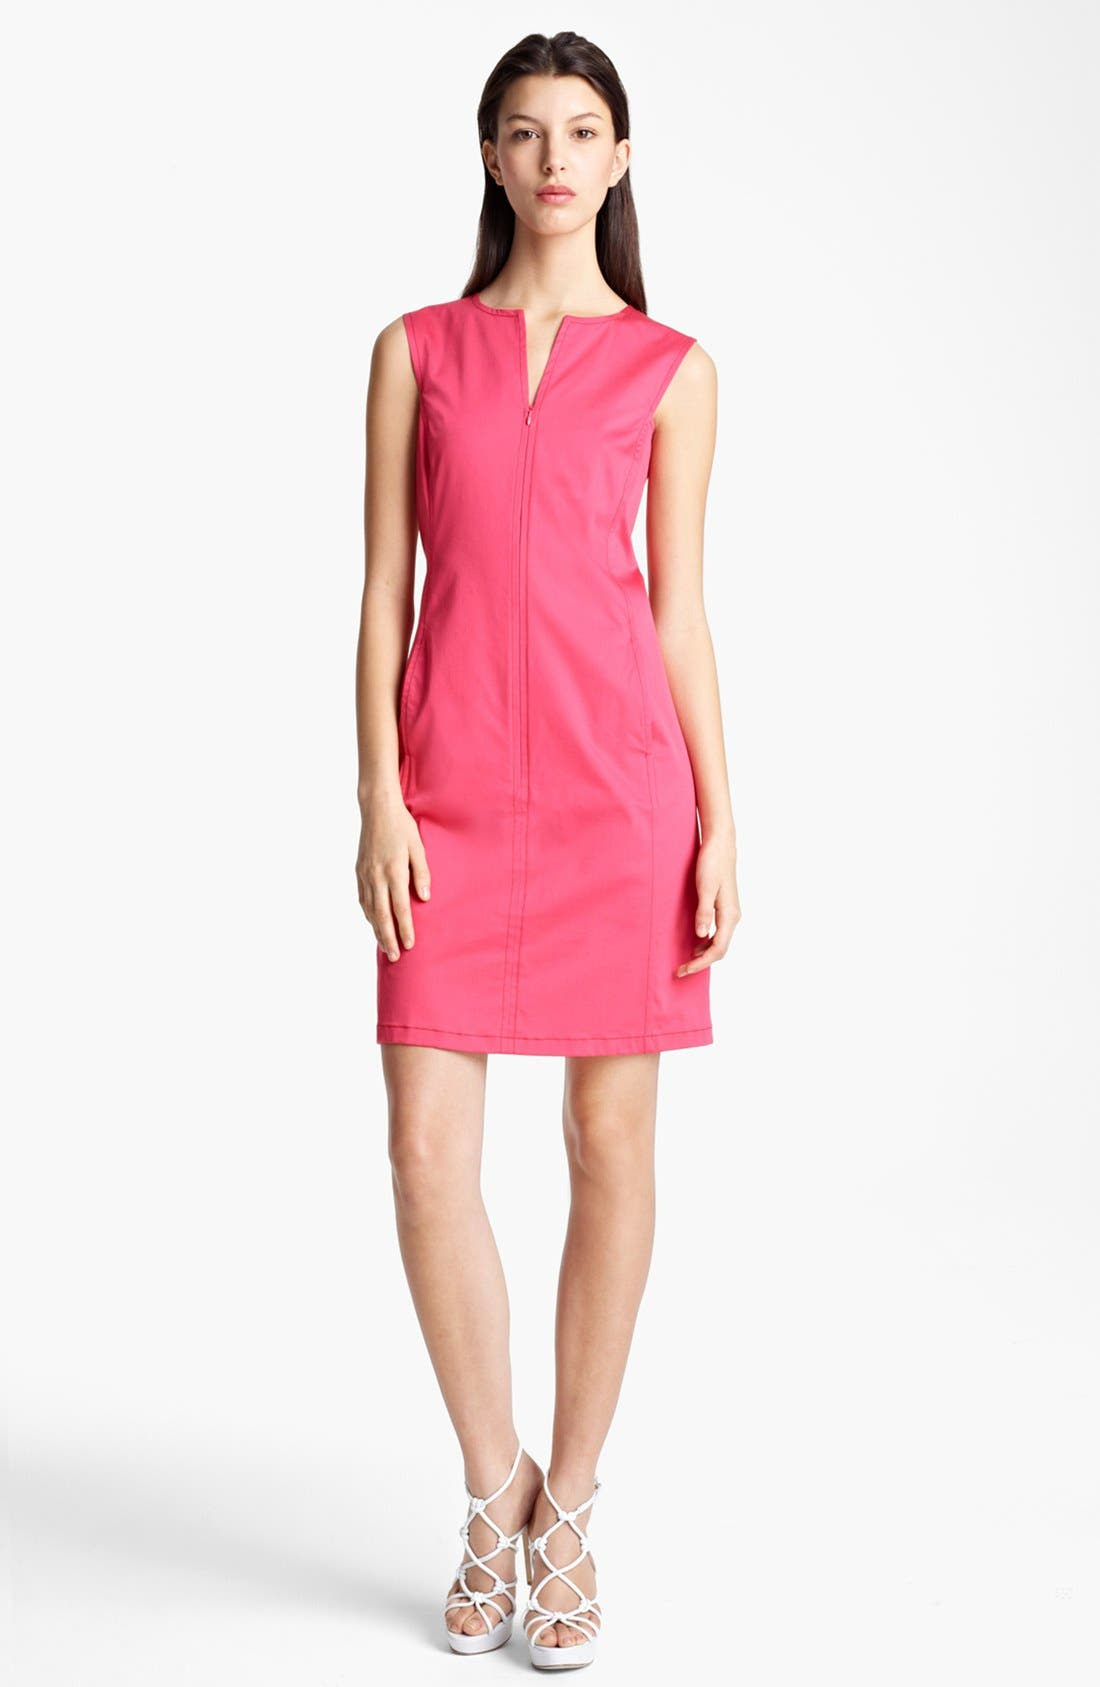 Alternate Image 1 Selected - Armani Collezioni Zip Front Dress